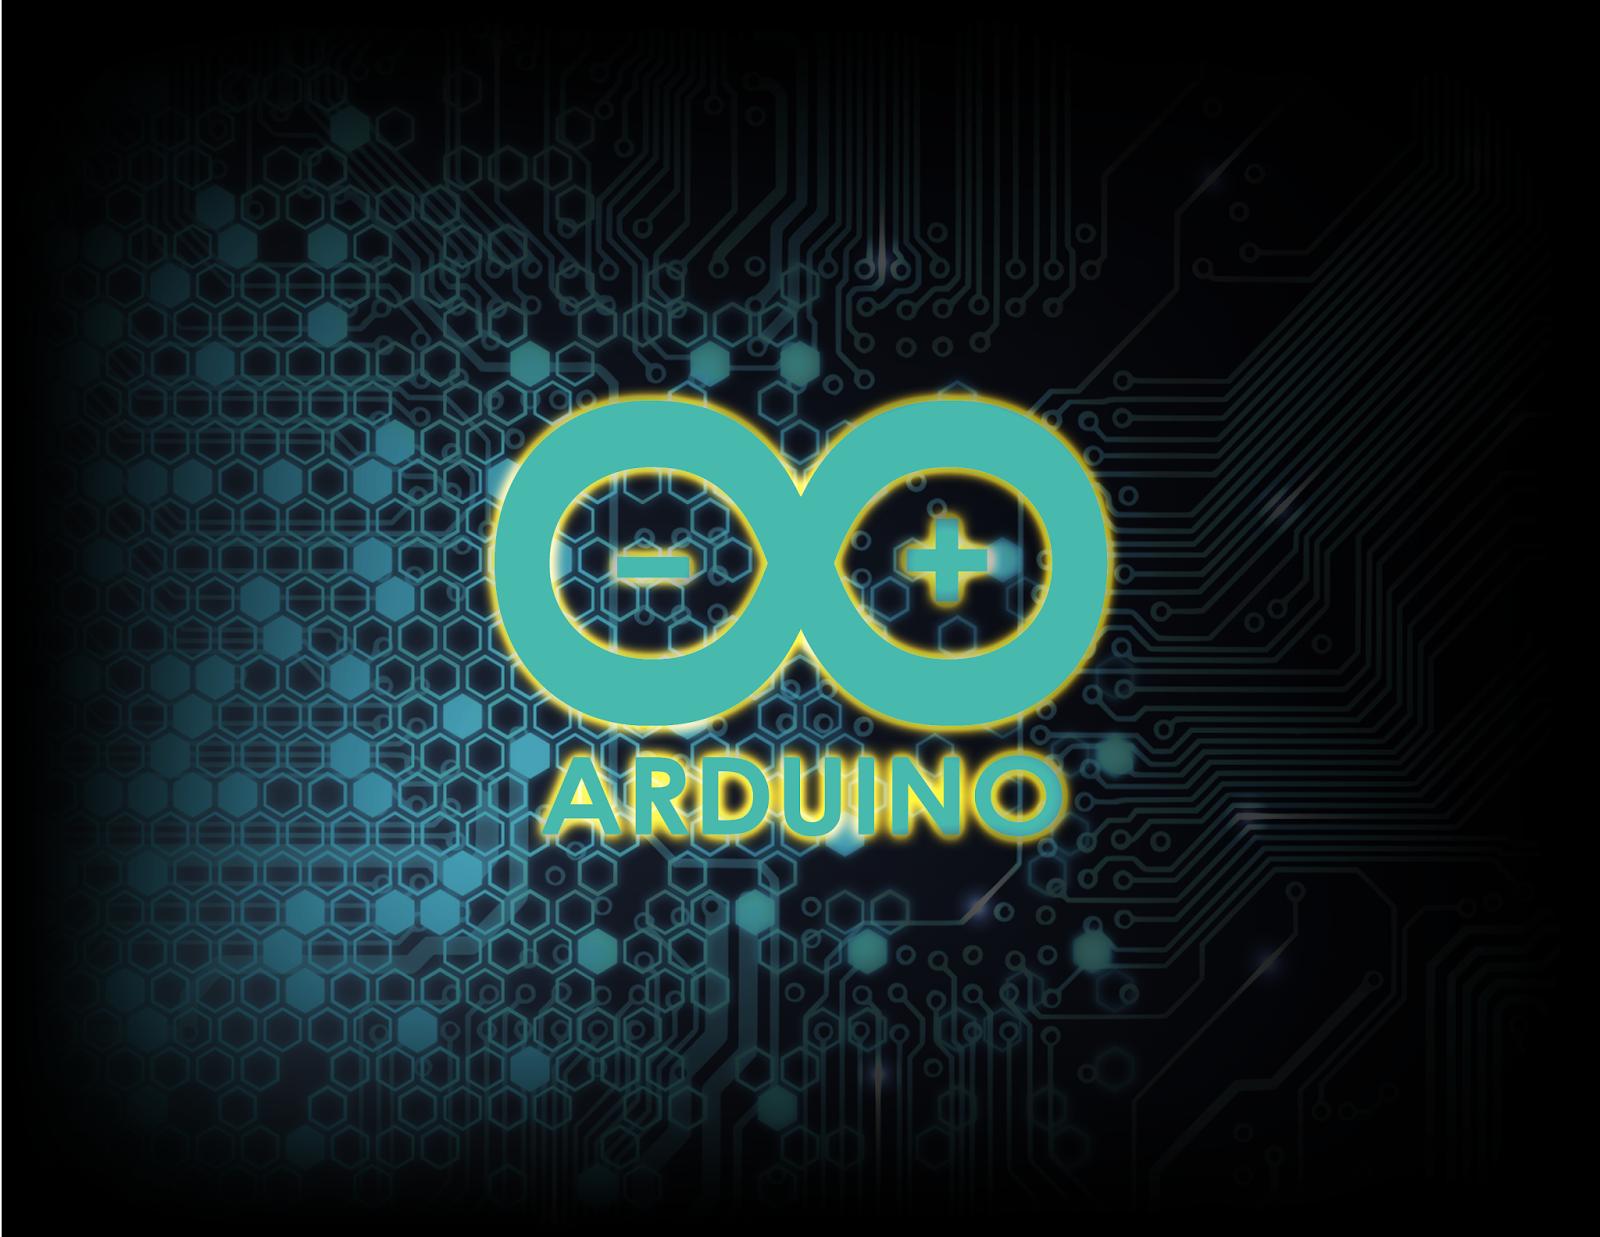 Arduino timotei istvan erdei by robotics on